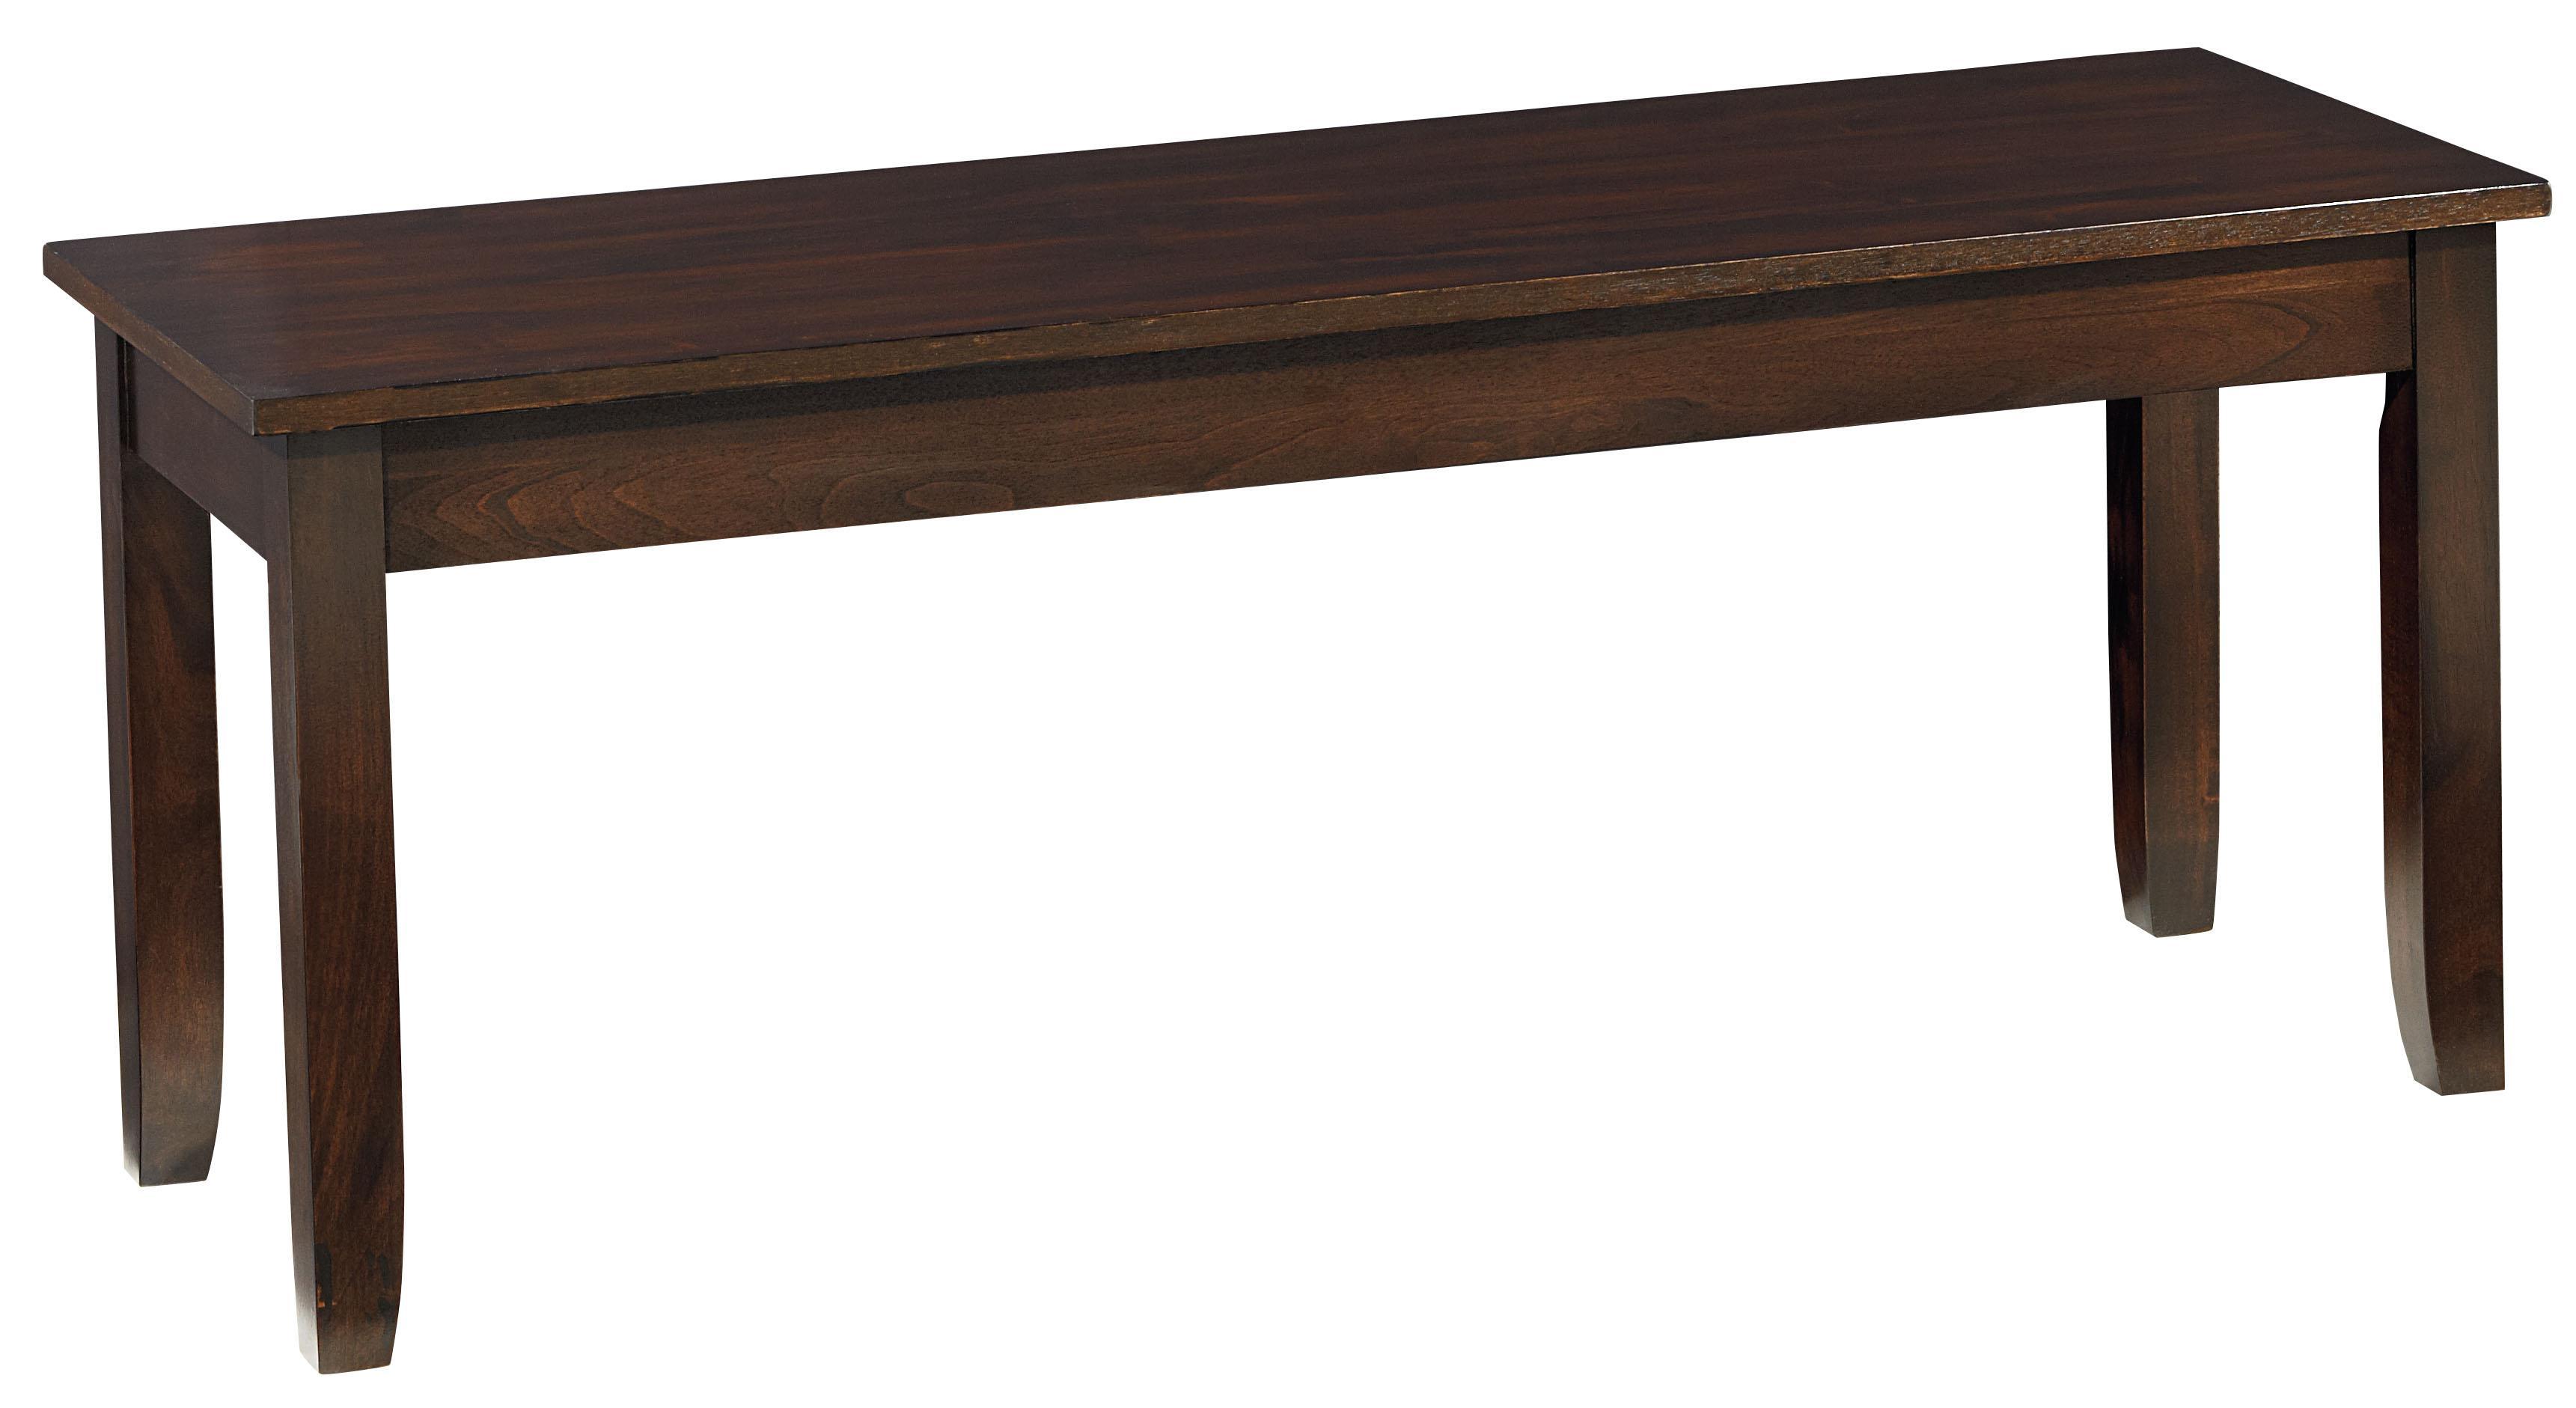 Standard furniture larkin wooden dining bench with chamfered legs standard furniture larkin dining bench item number 15245 geotapseo Choice Image